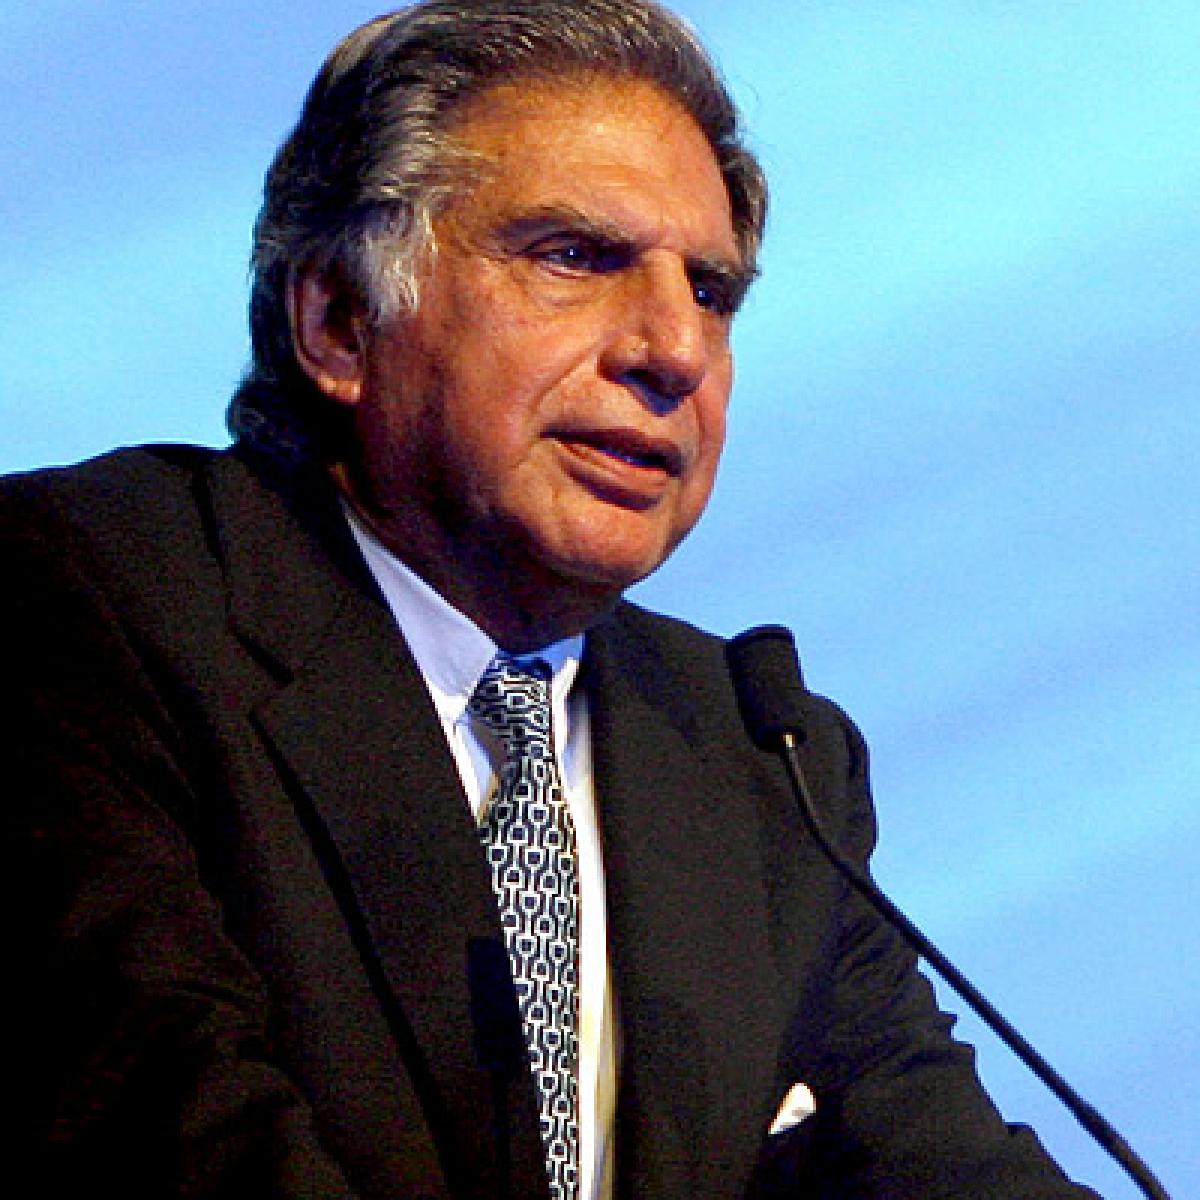 Philanthropy: Tata Trusts donates Rs 500 crore to help fight coronavirus pandemic